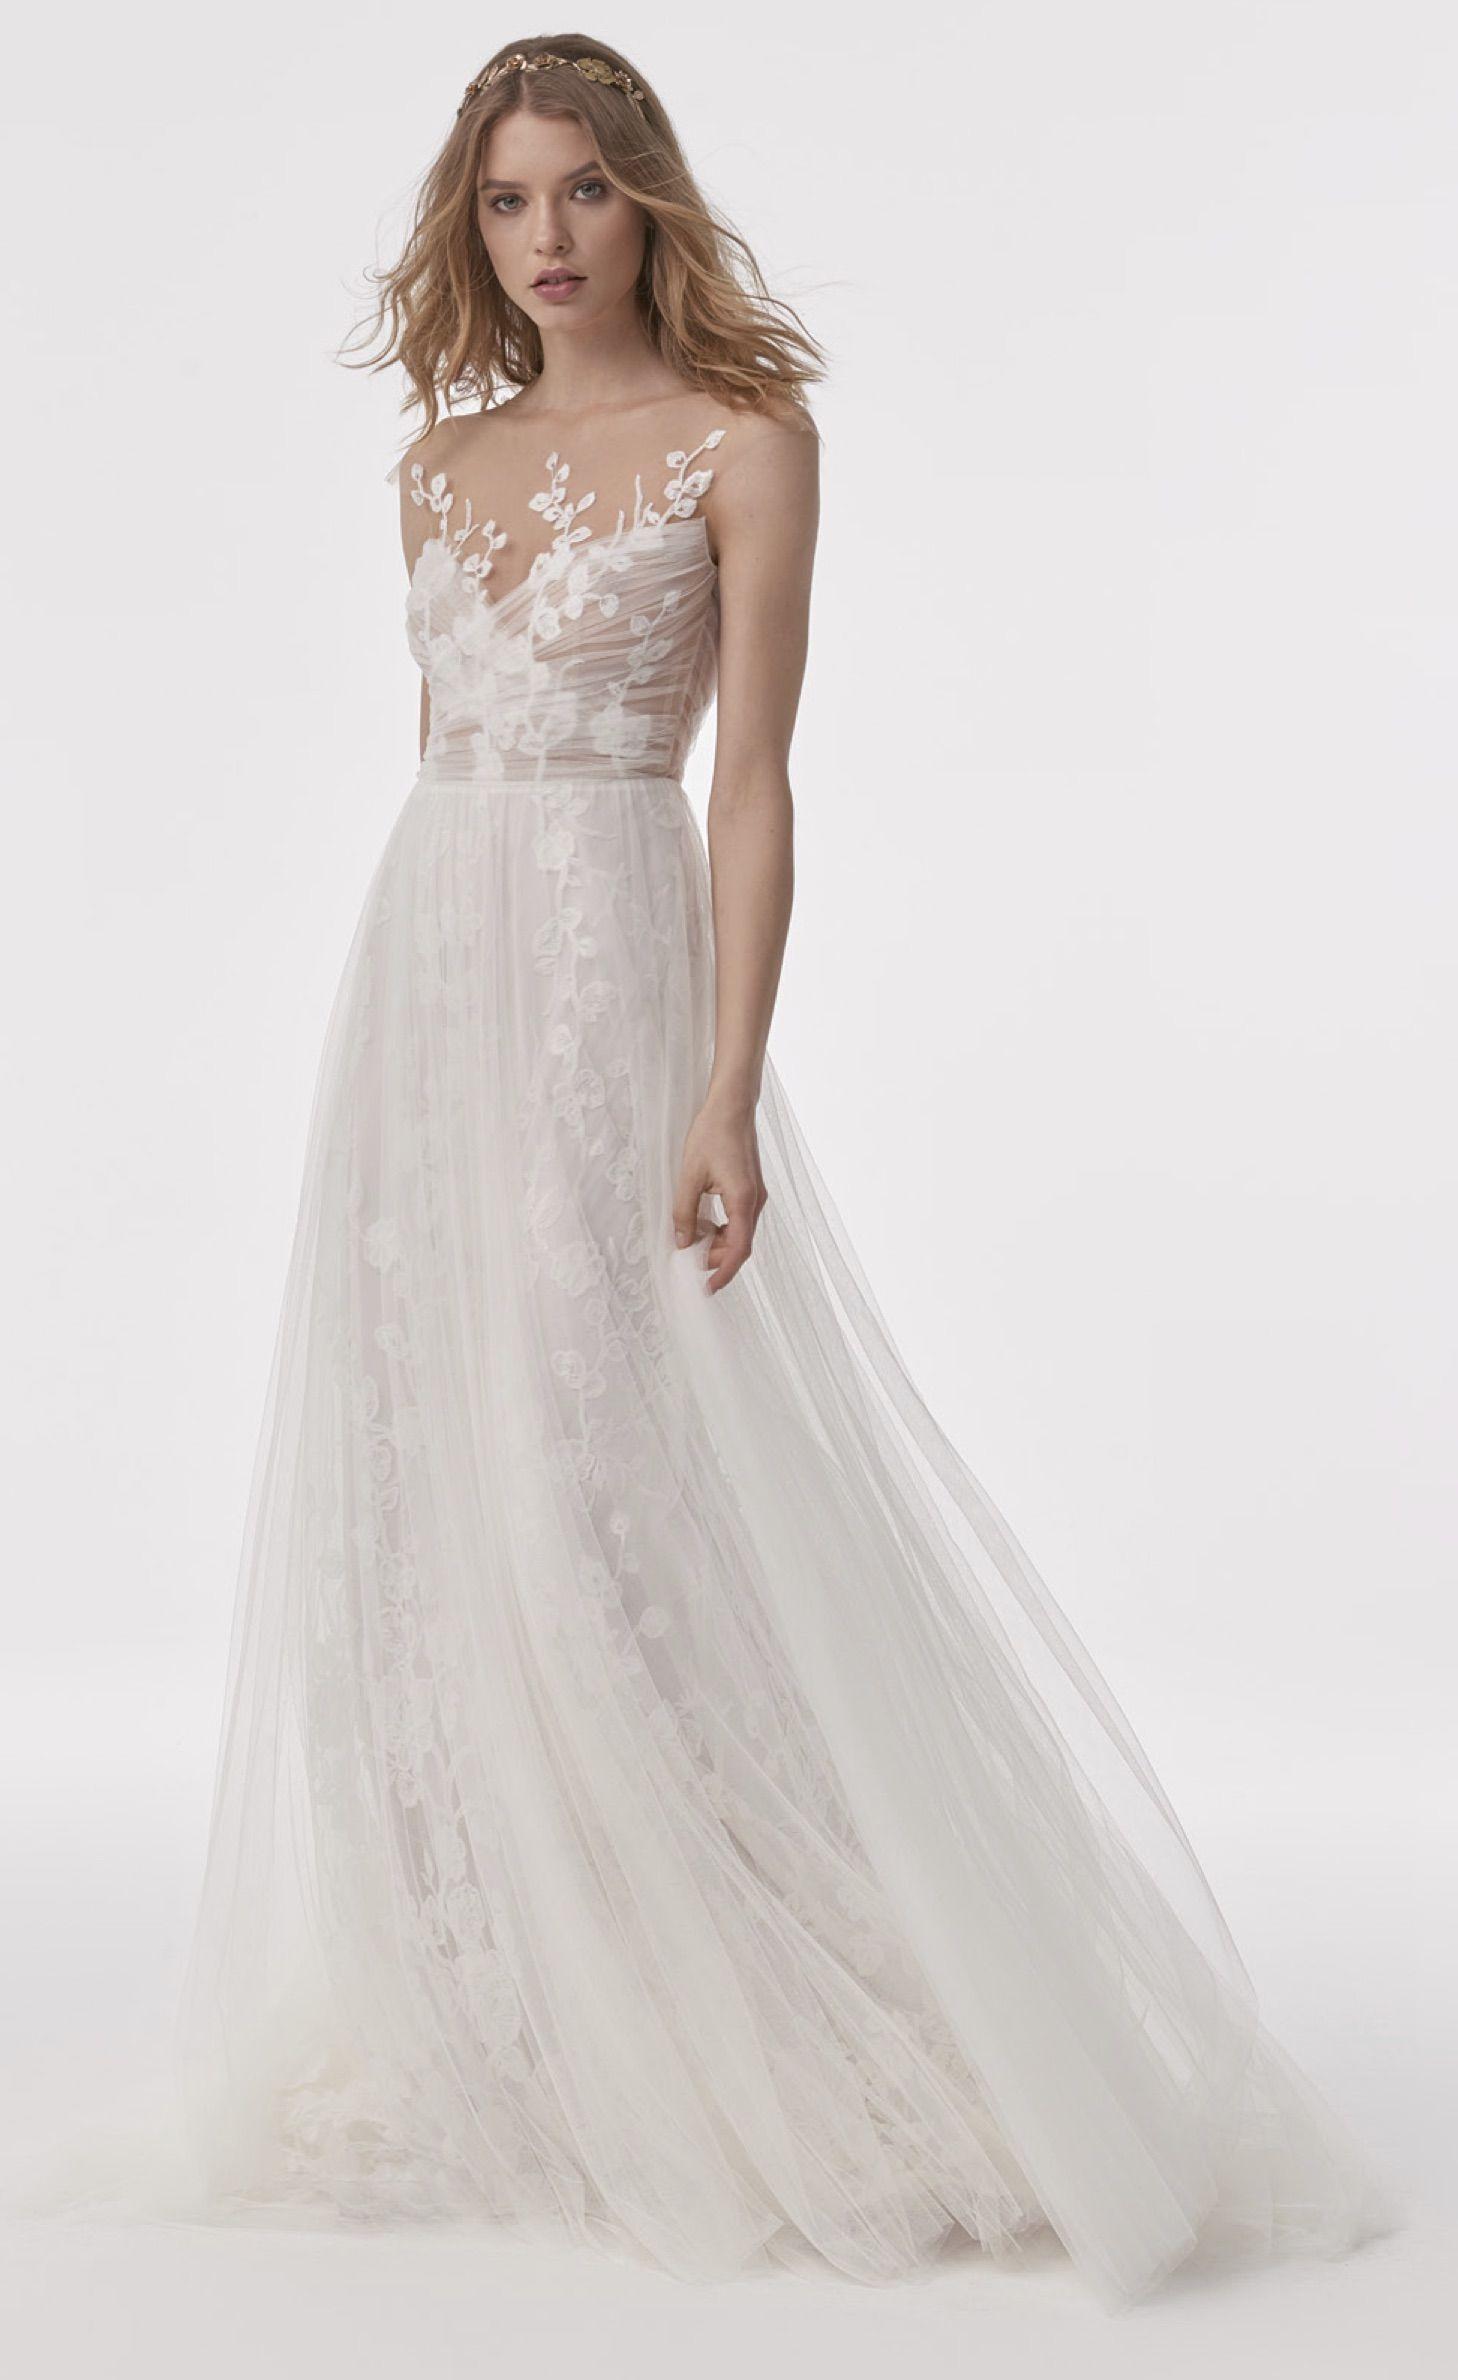 Anna Kara Roma Wedding Dresses Bridal Wedding Dresses Dresses [ 2380 x 1458 Pixel ]